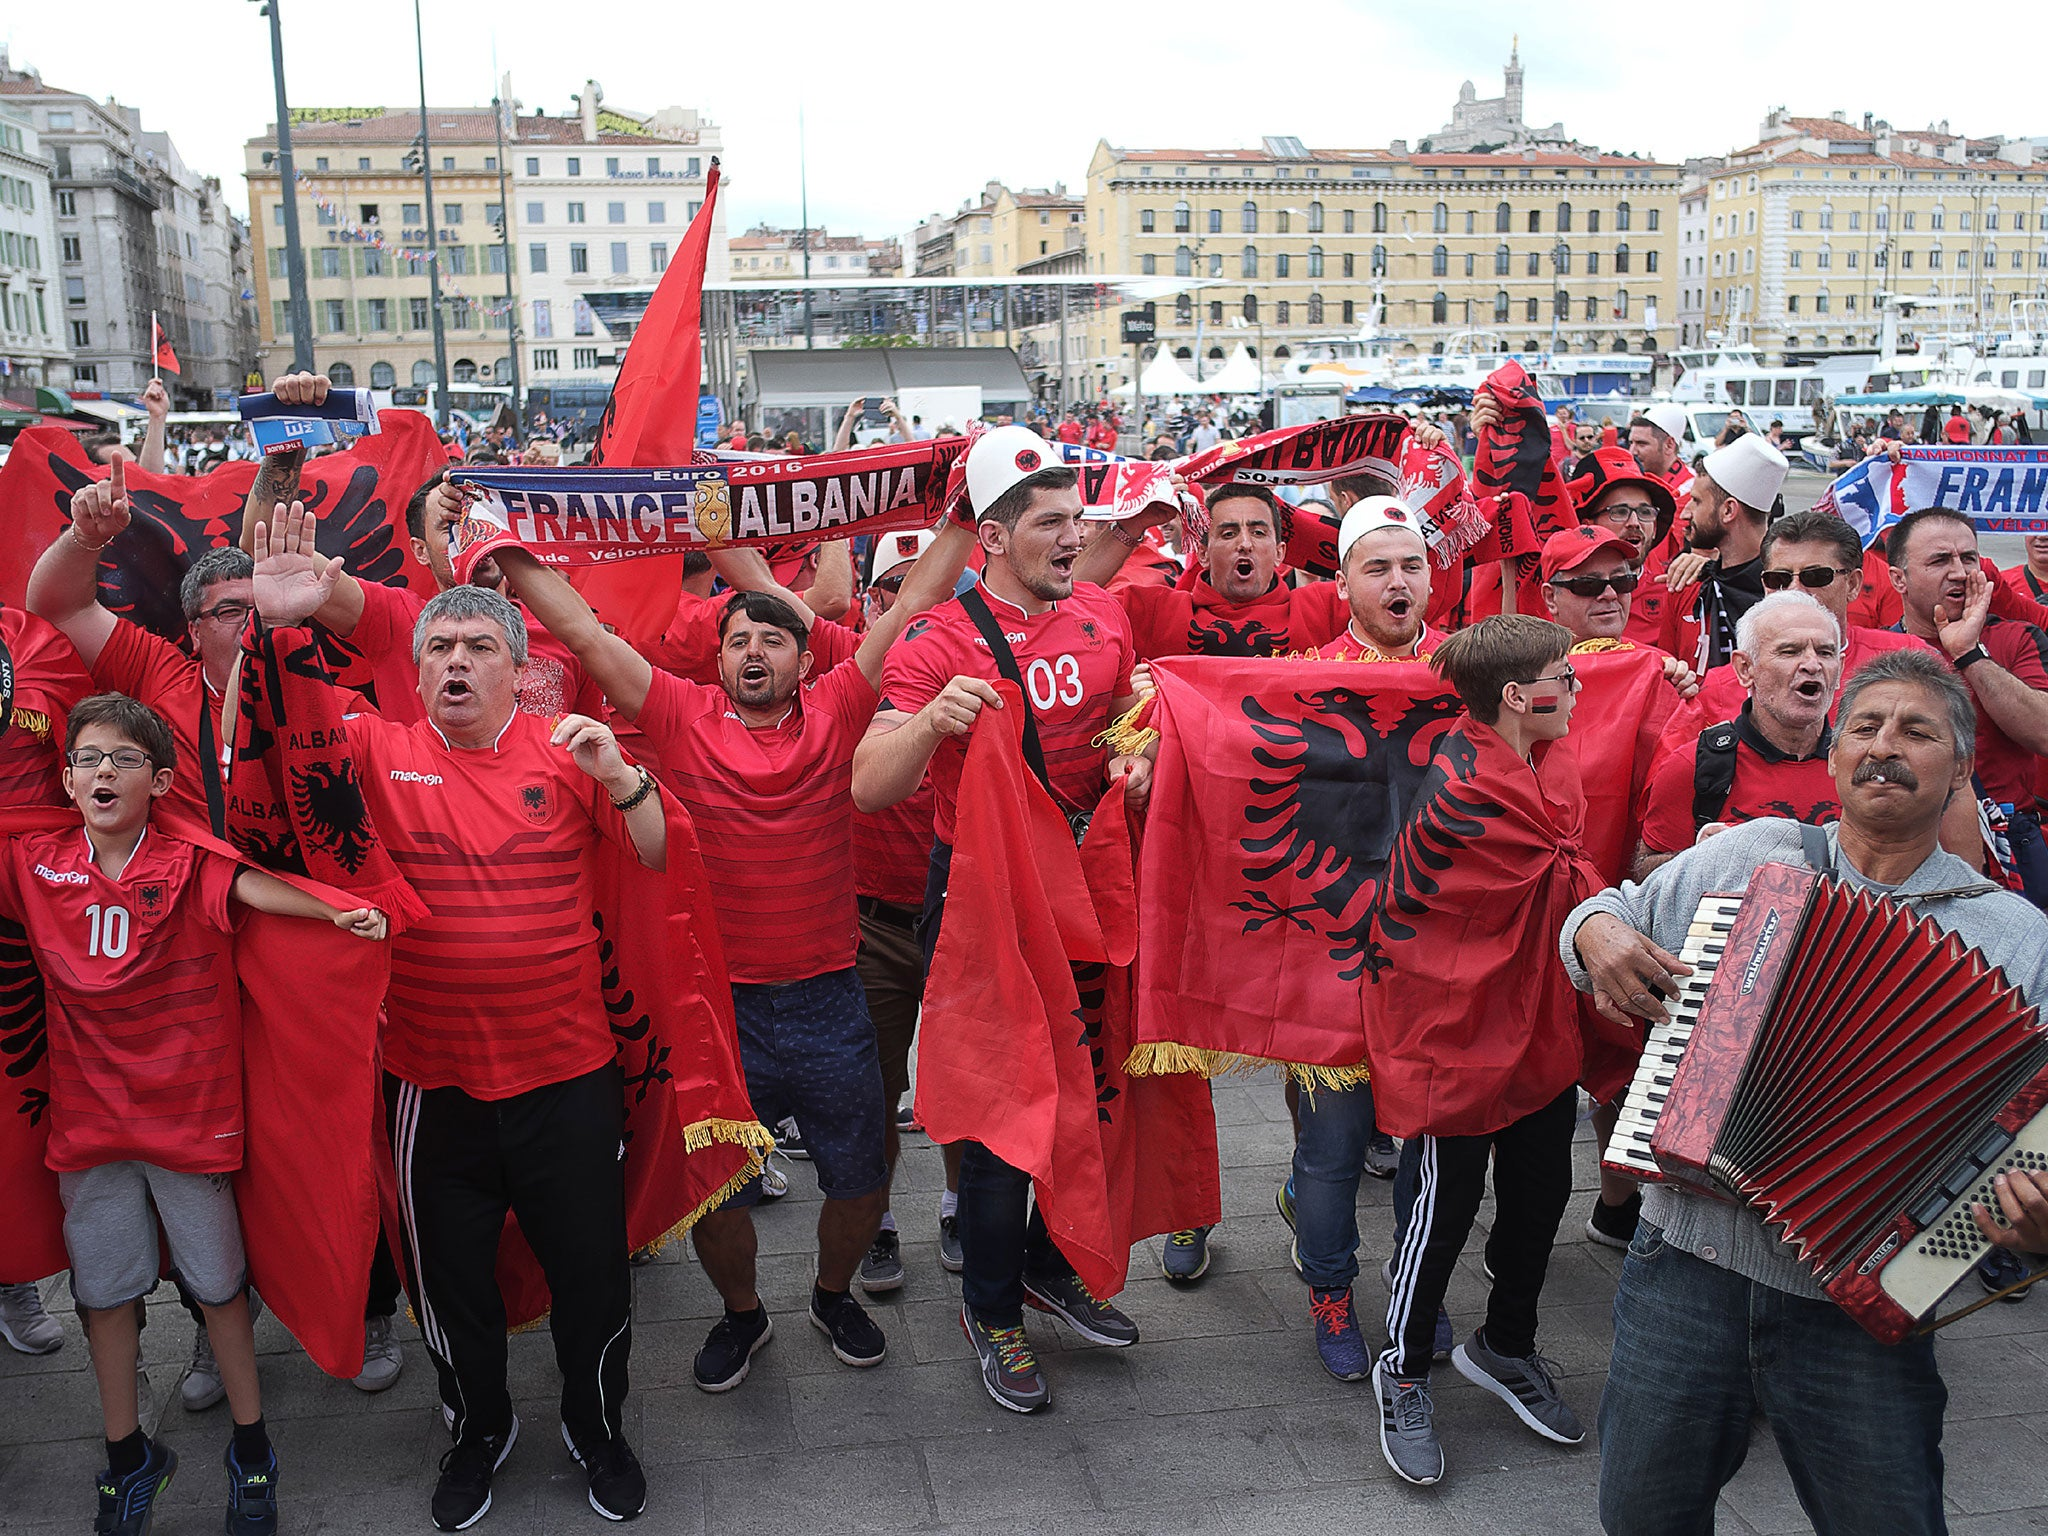 albania vs france - photo #34